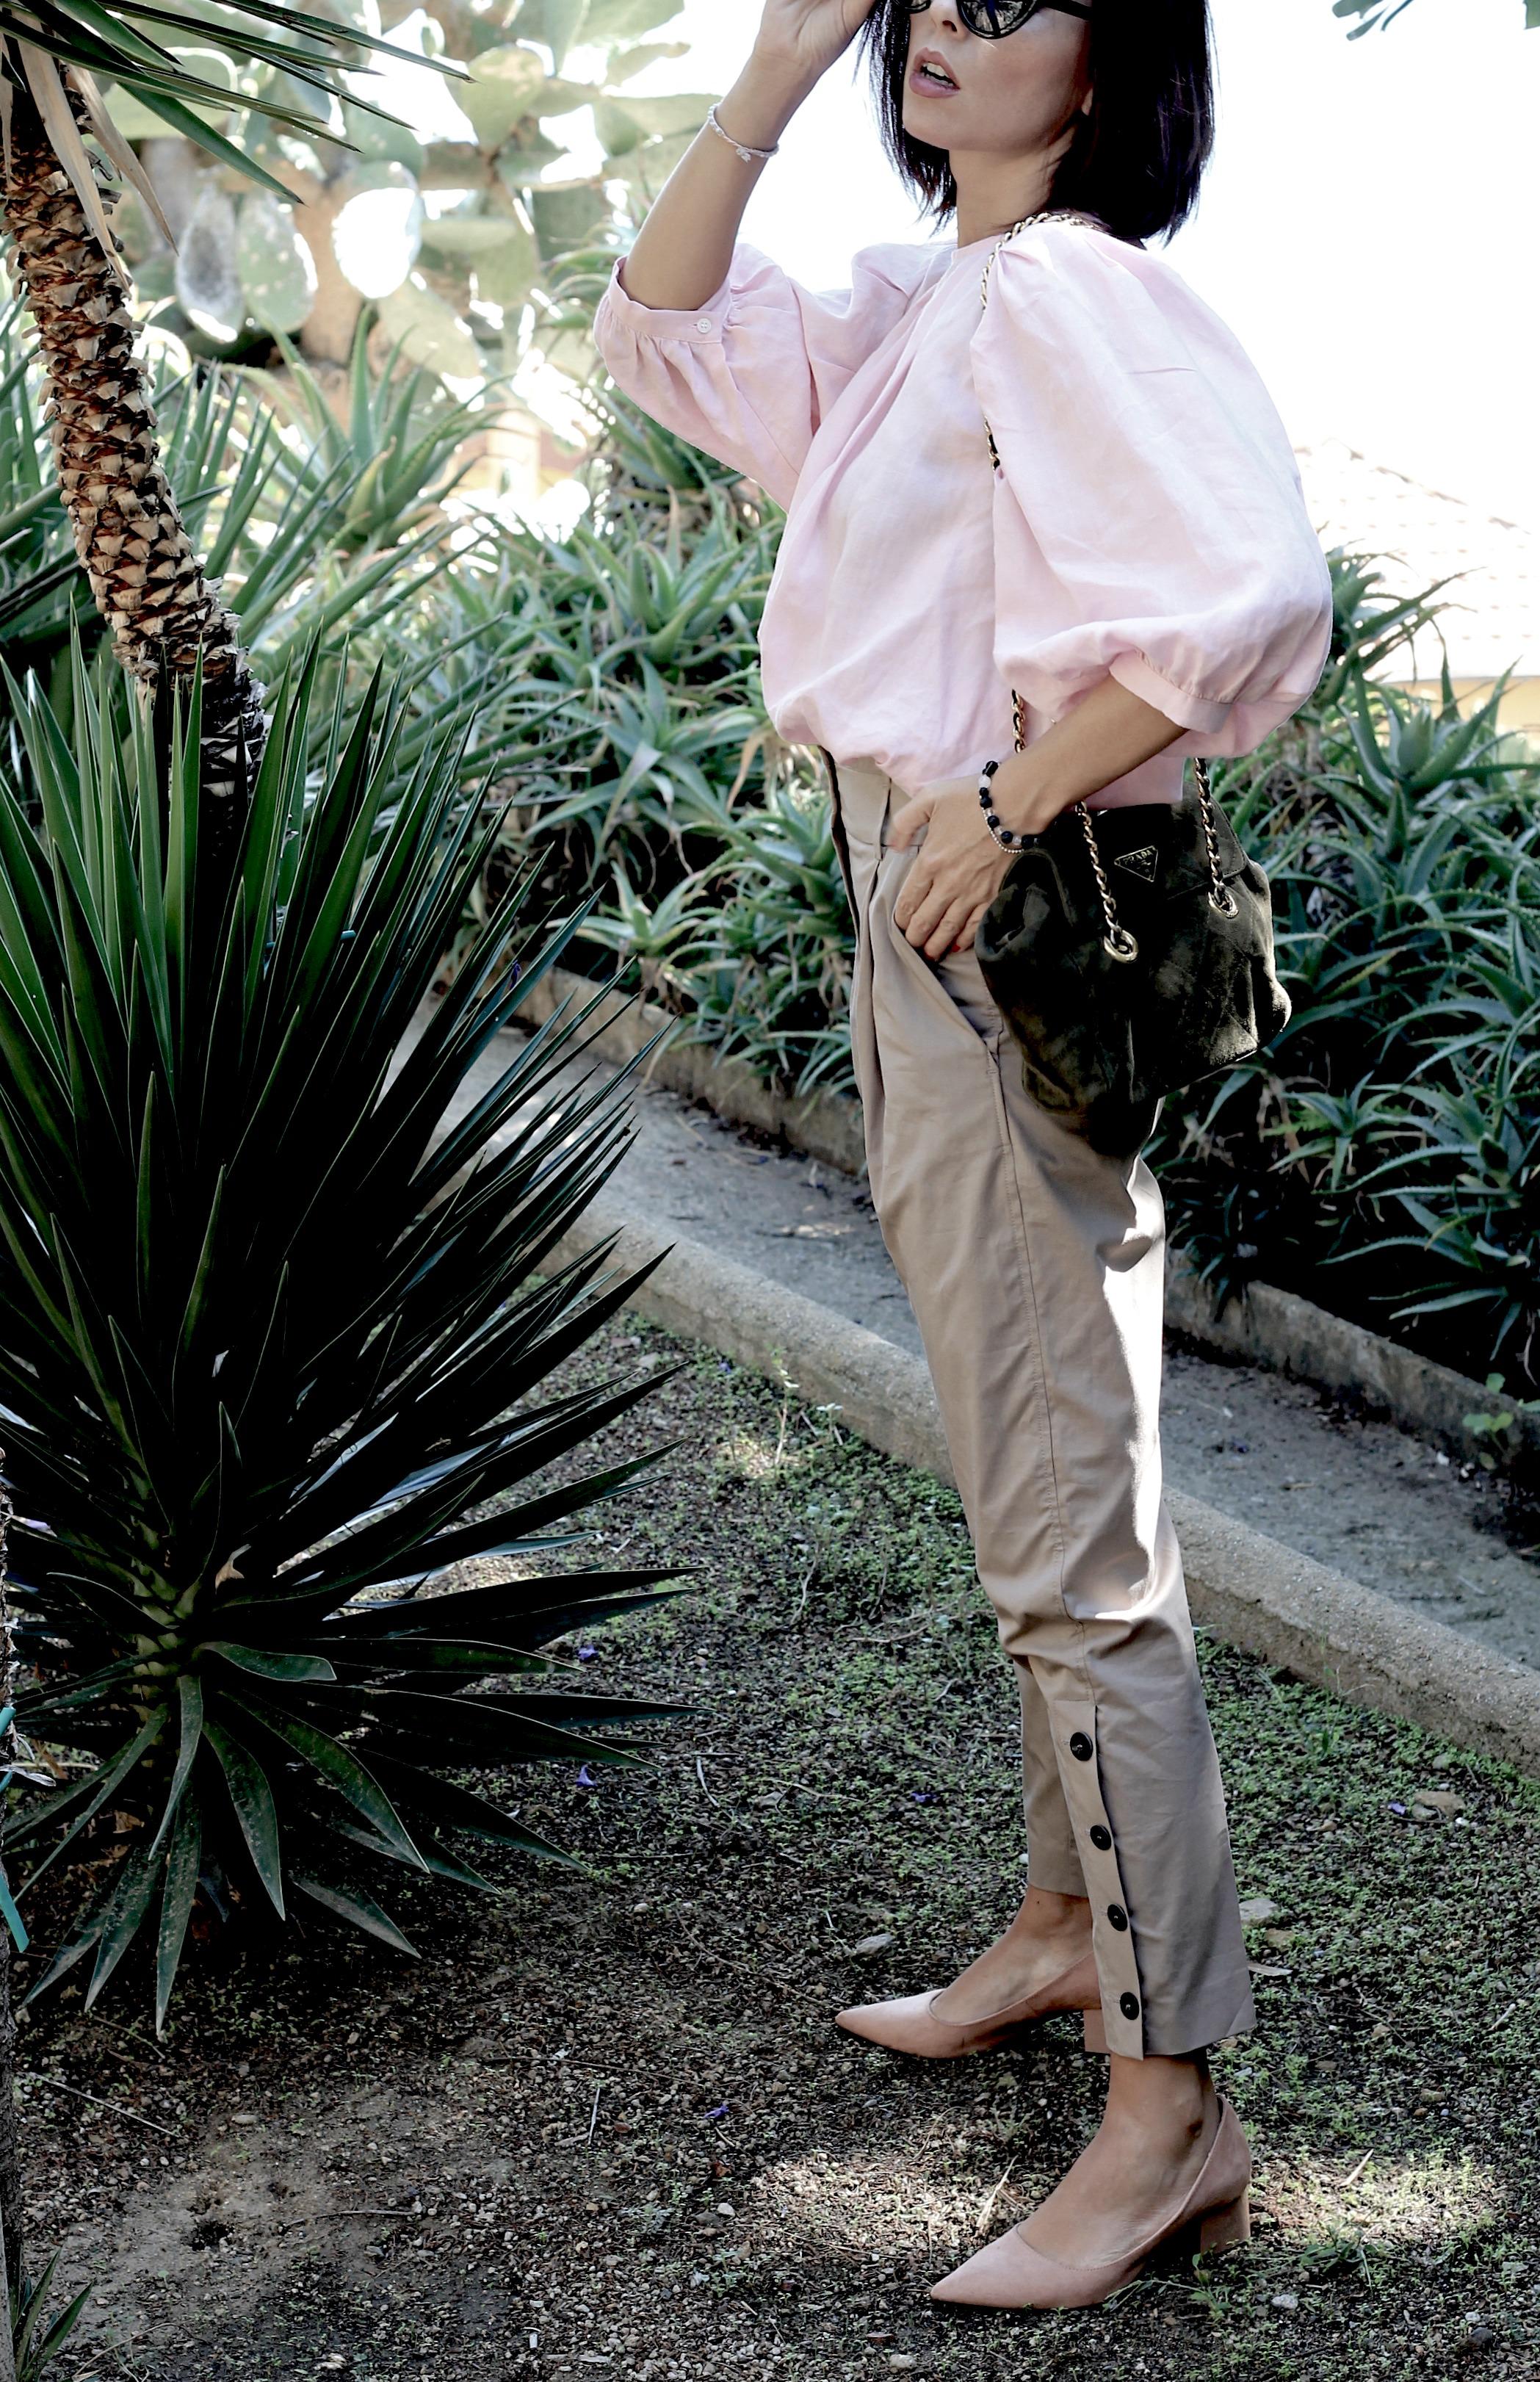 Moda e consumismo, consumi di moda 2017, consumi di moda tendenze, theladycracy.it, elisa bellino, frankieshop outfit 2017, come vestirsi a settembre 2017, outfit lavoro autunno 2017, cosa mi metto lavoro autunno 2017, outfit rosa autunno inverno 2017, elisa bellino, fashion blog 2017, blogger moda 2017, blogger moda milano 2017, blogger moda più seguite 2017, fashion blogger italiane 2017, fashion blogger famose 2017